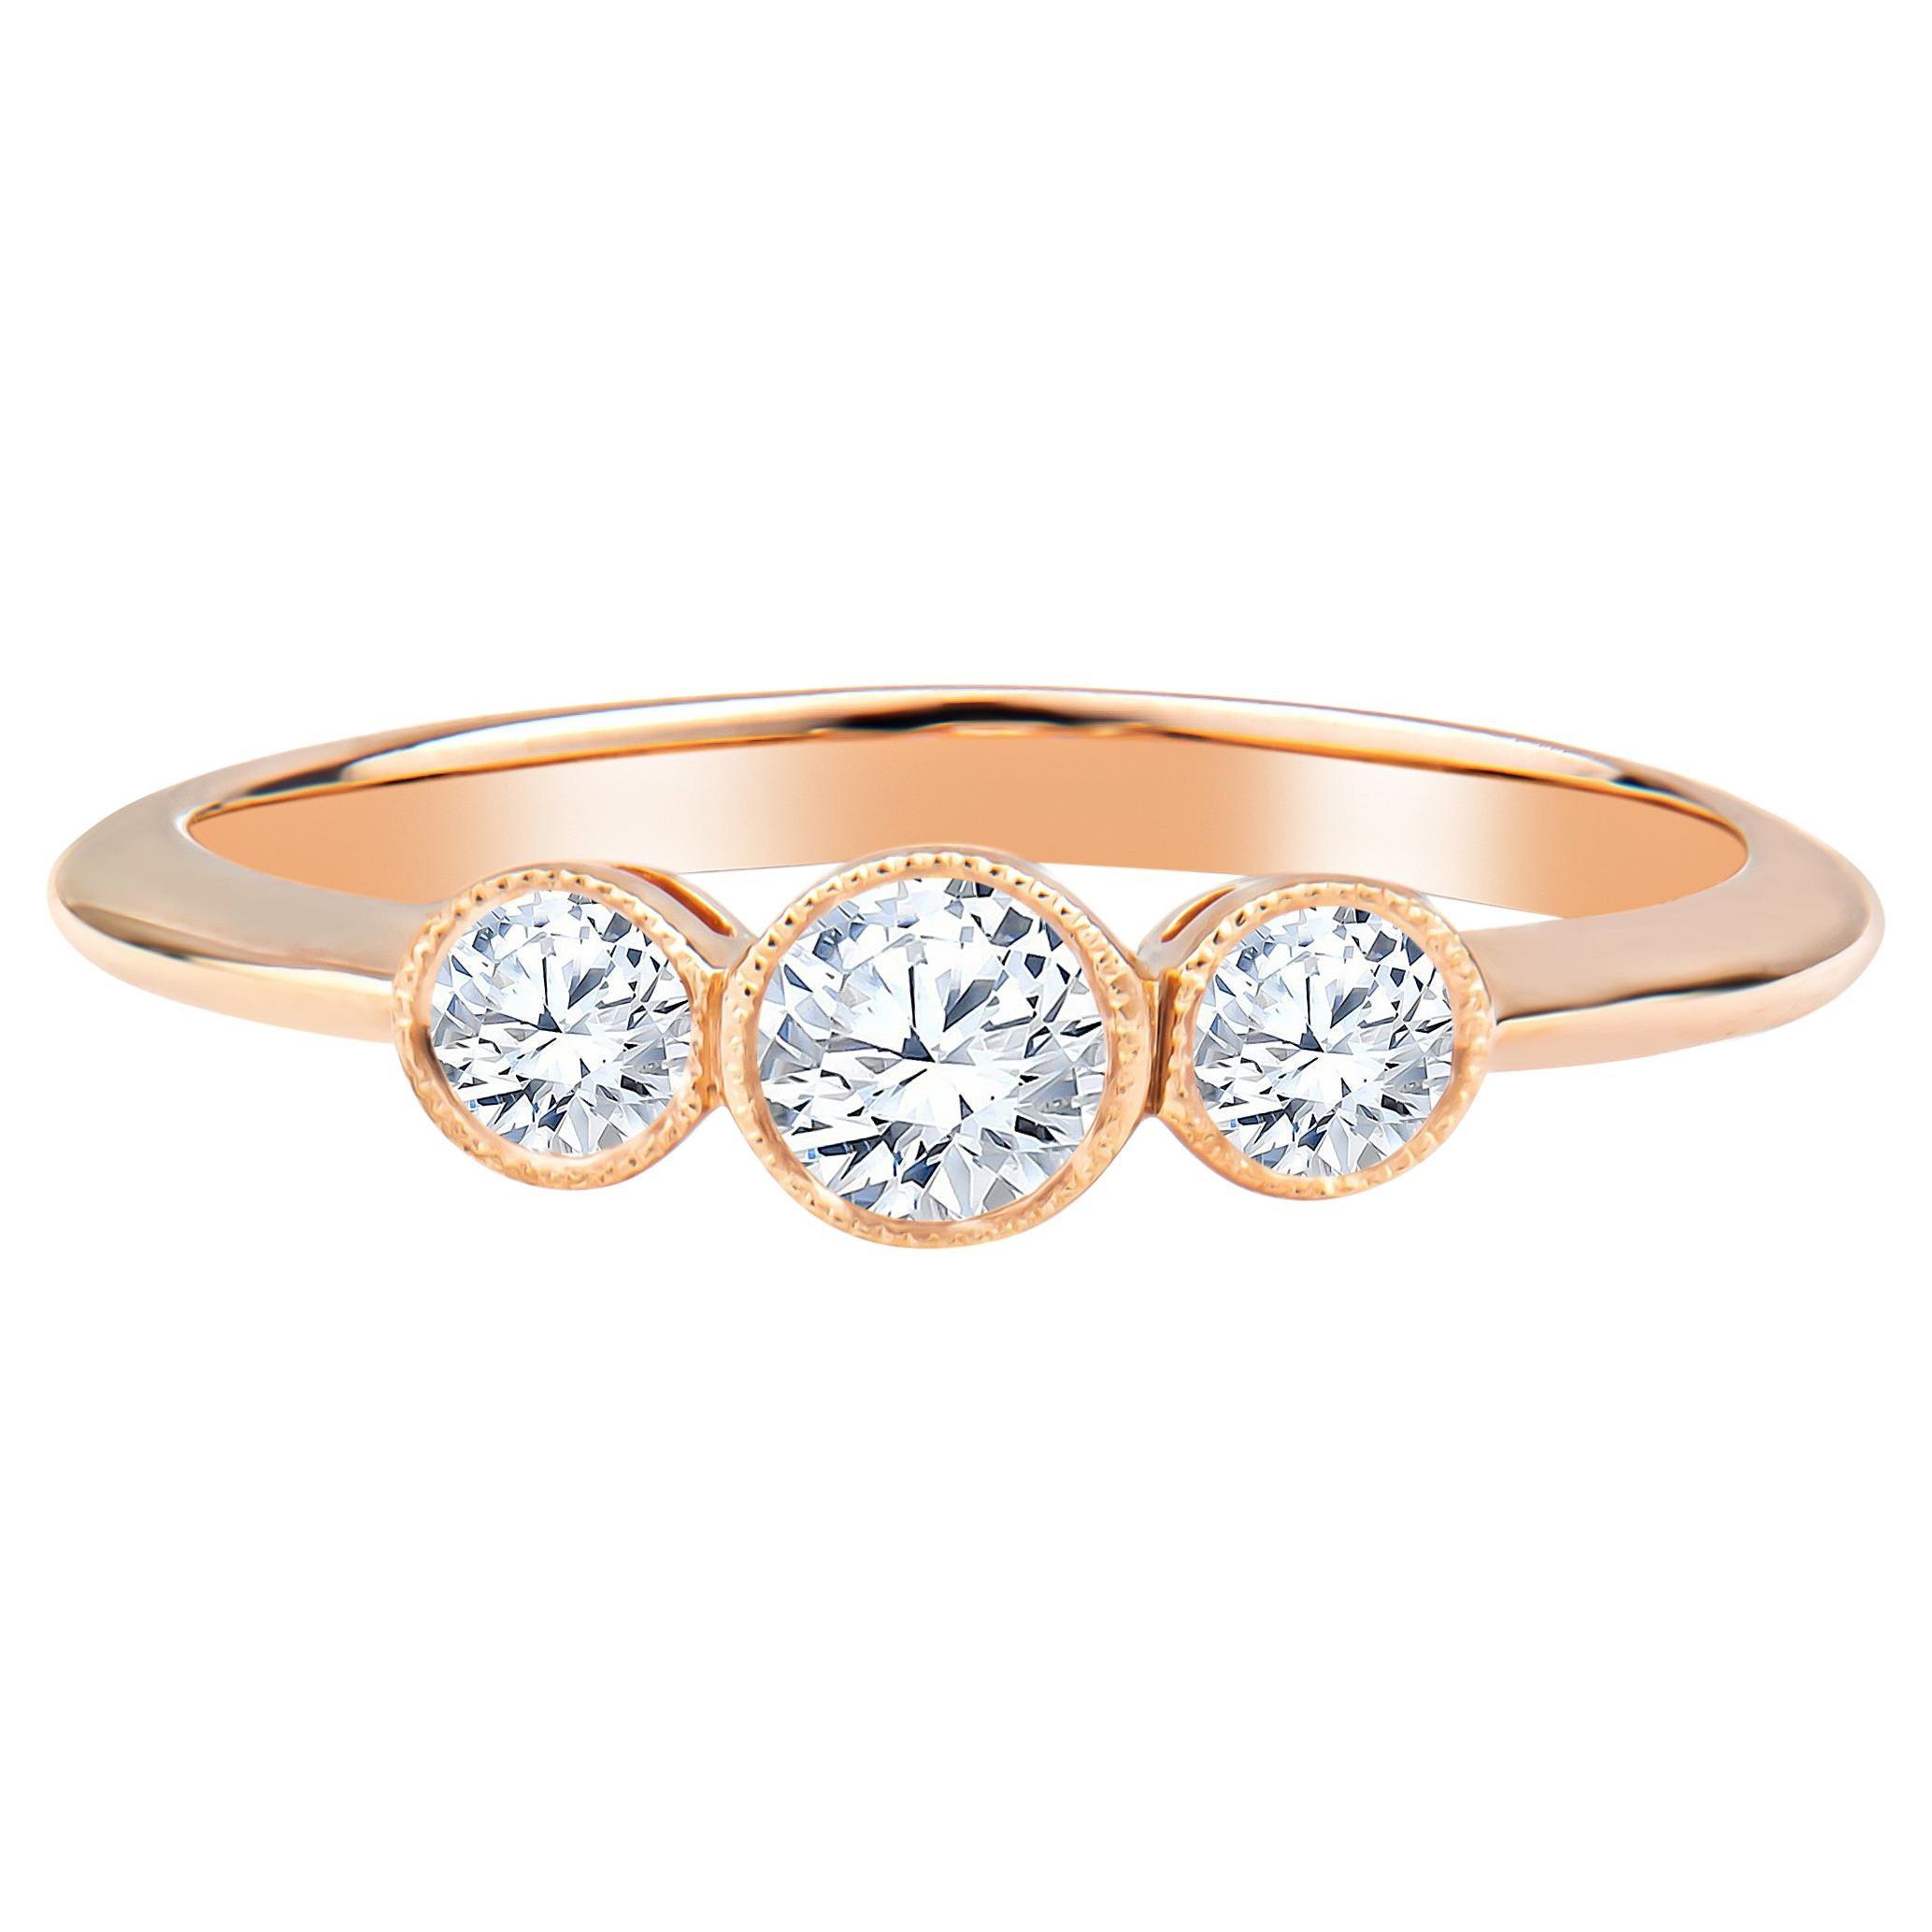 Tiffany & Co. 3-Stone 0.33ctw Round Diamond 18kt Rose Gold Ring 'D-F. VS2-VVS1'